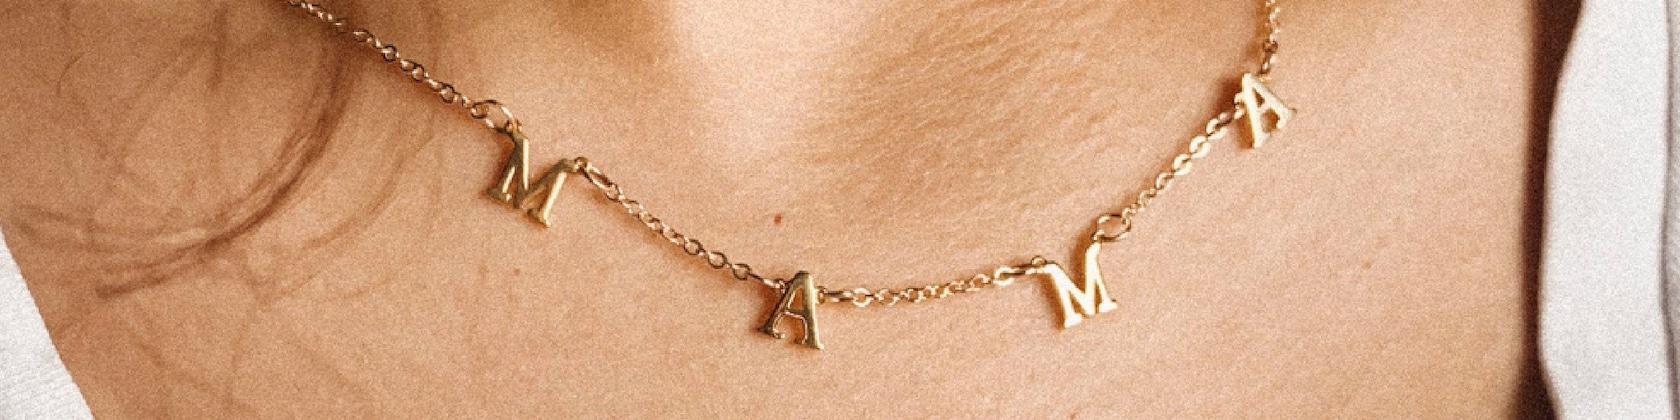 "Personalized Necklace /& Bracelet Set for 18/"" Dolls Handmade American Girl Names"